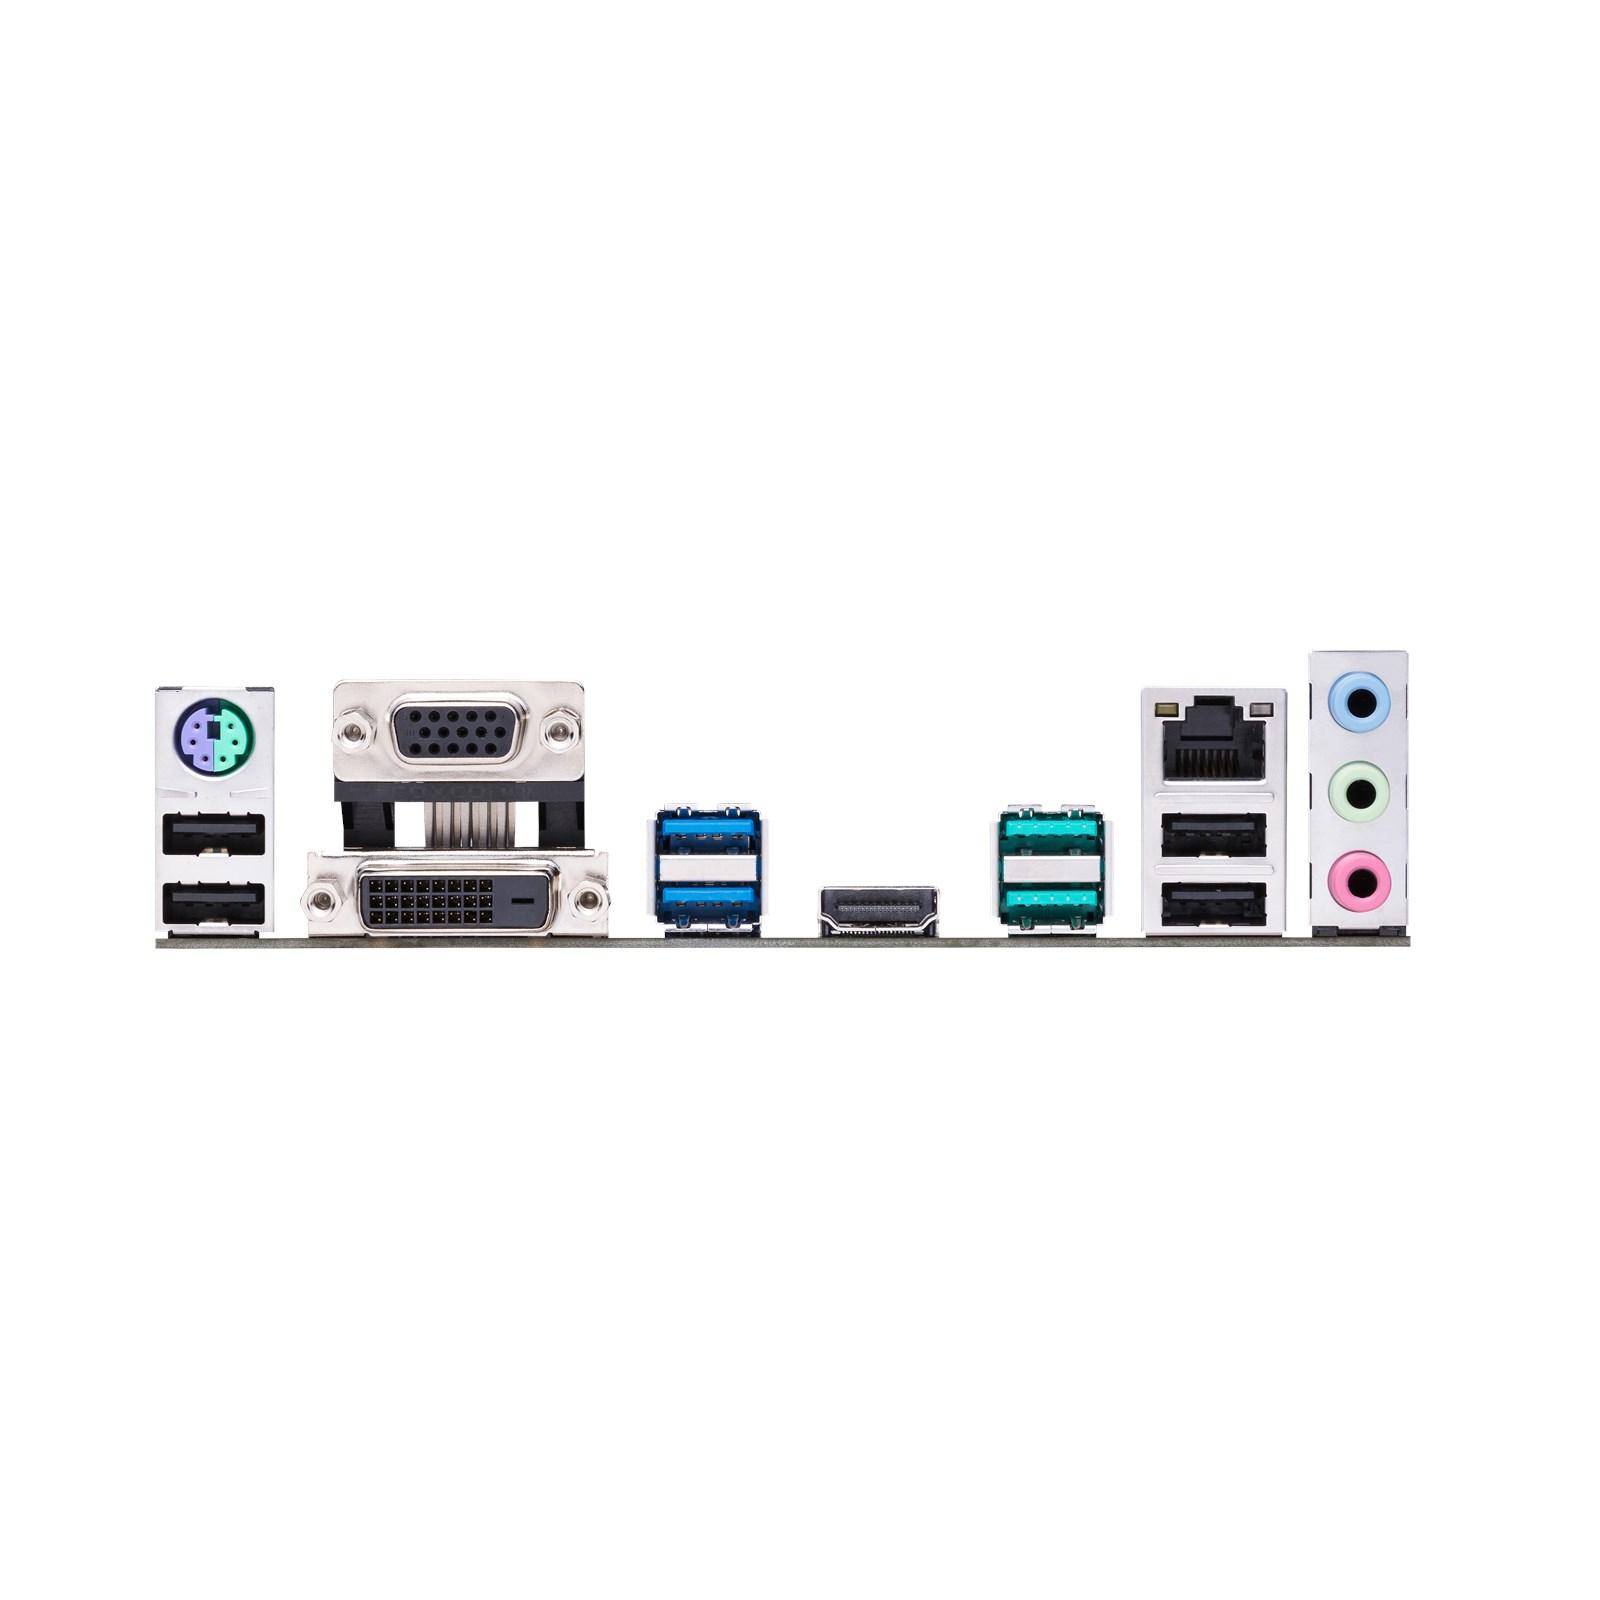 ASUS PRIME B360-PLUS Intel Socket 1151 Motherboard